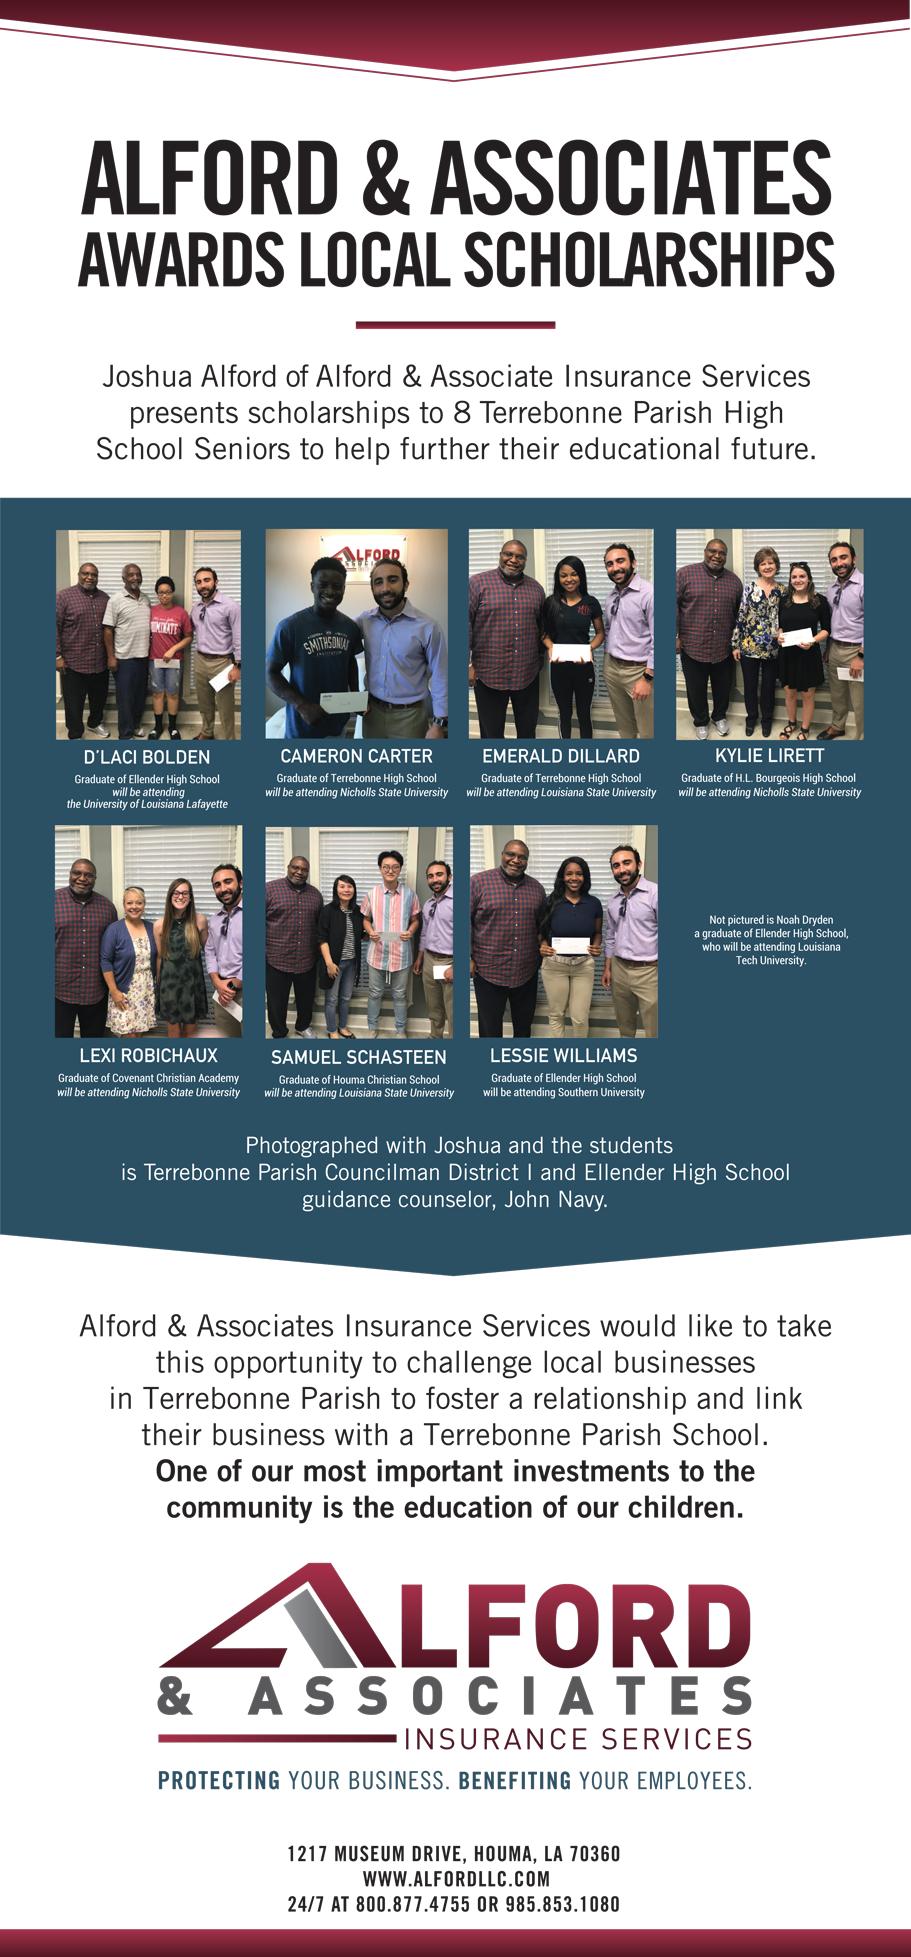 Alford & Associates   Alford & Associates Awards Local